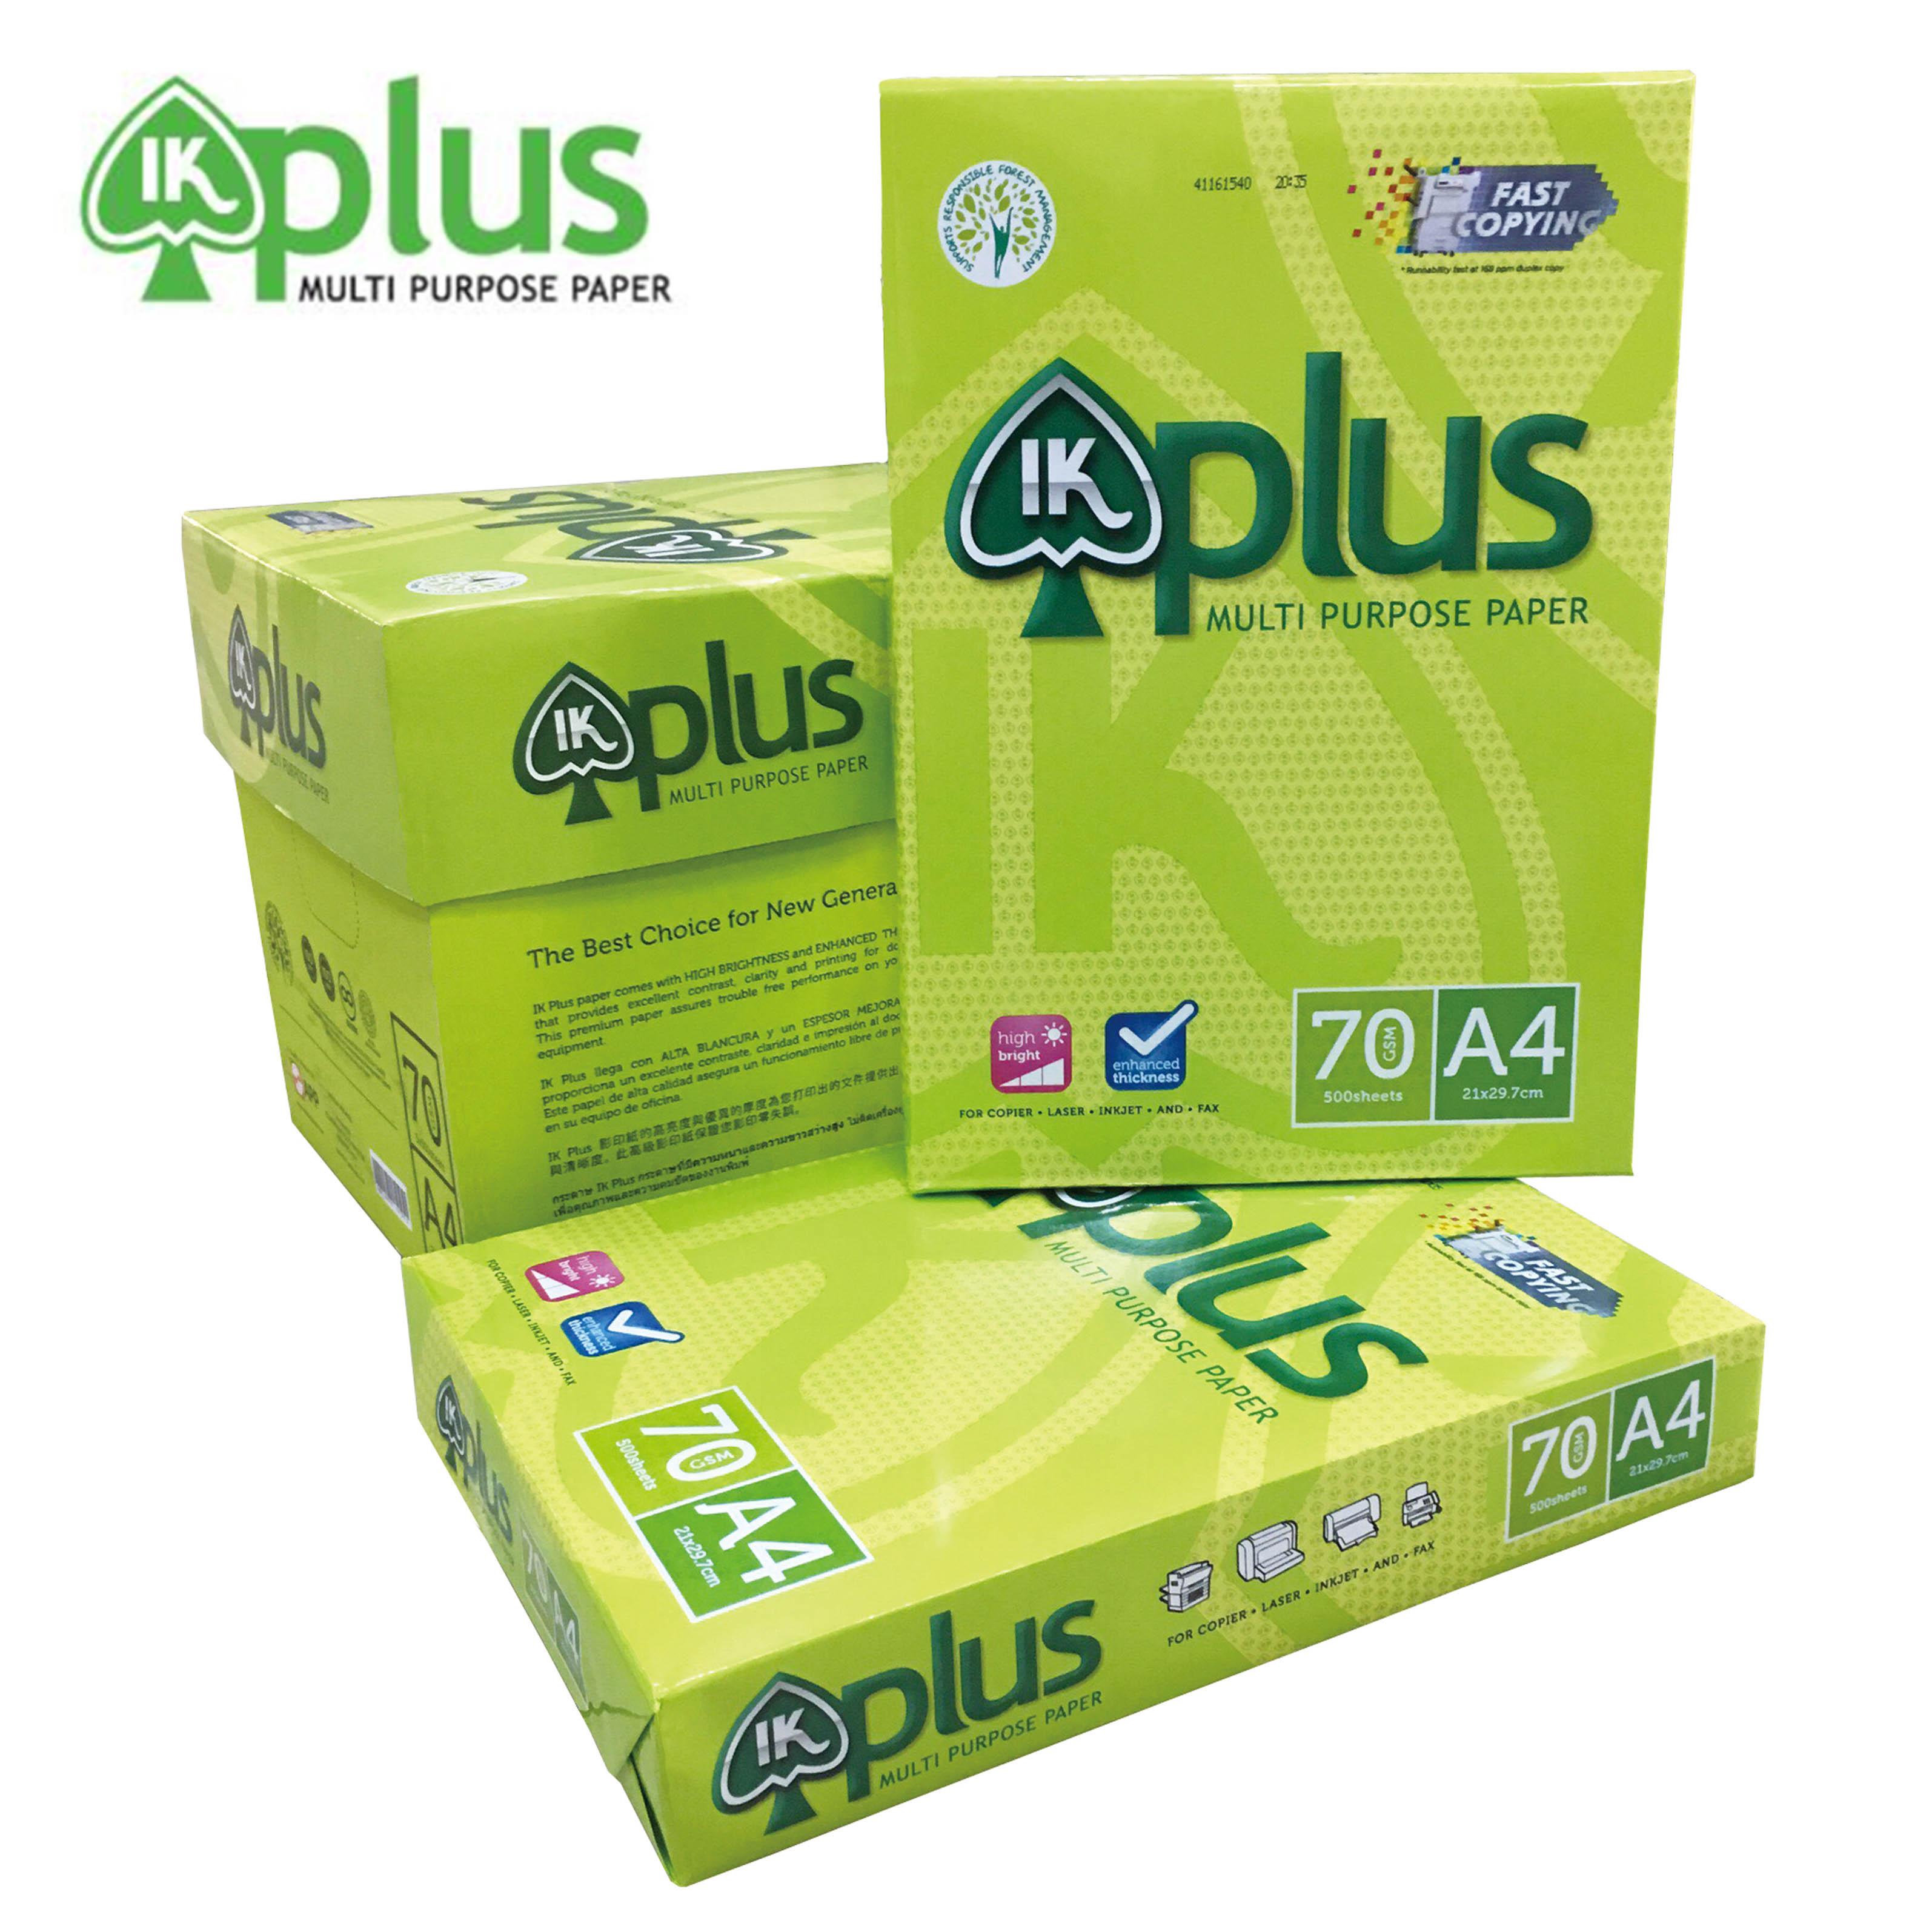 【IK-PLUS】  A4 影印紙 70磅 10包入/箱